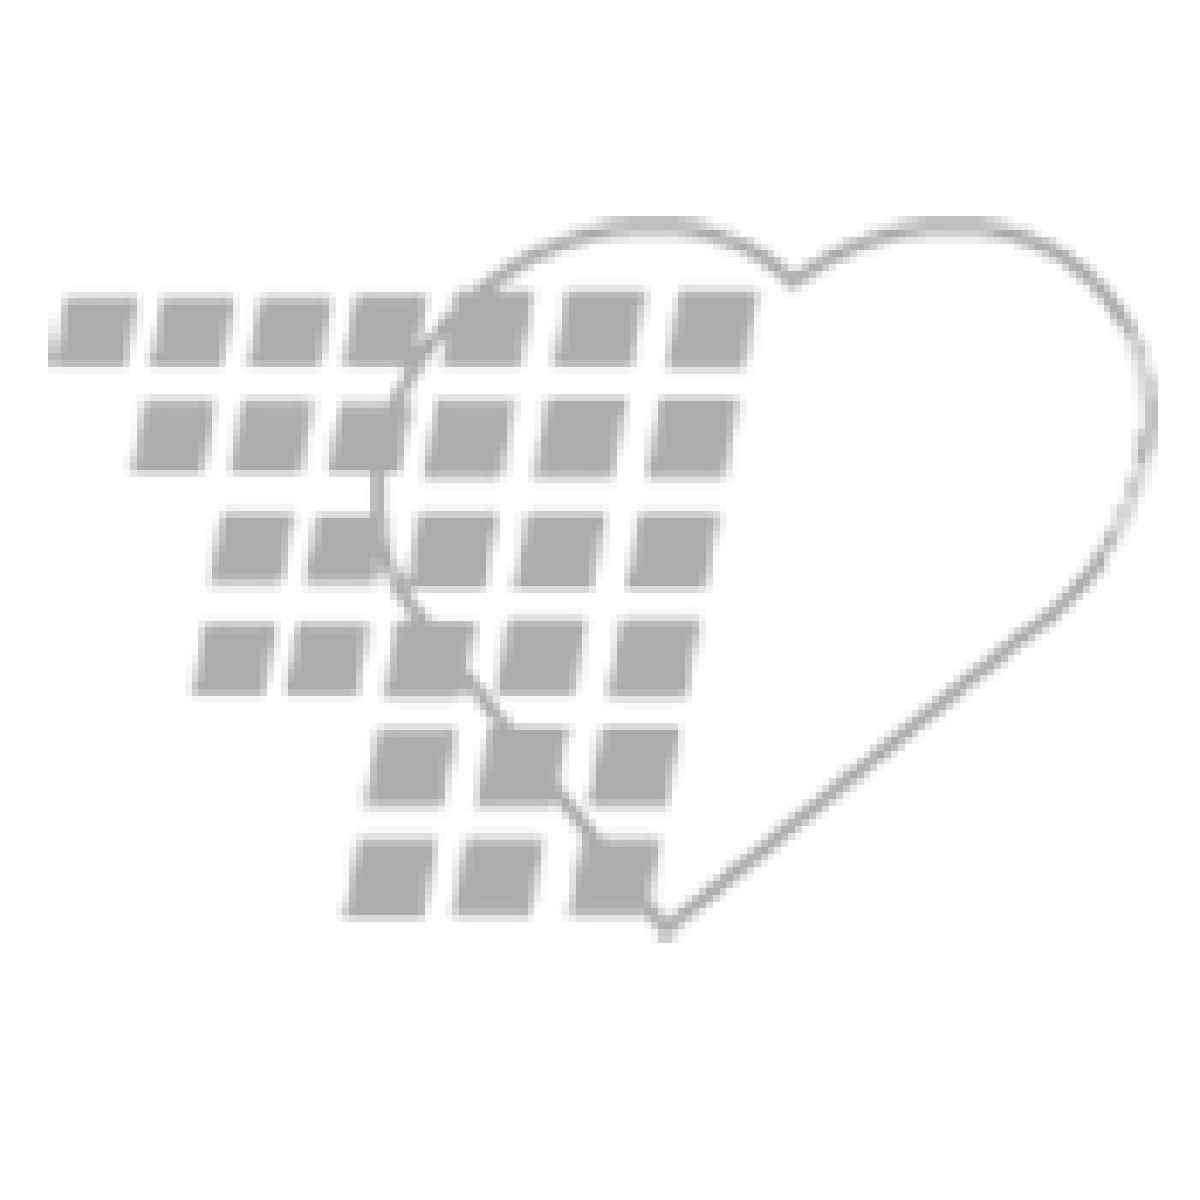 11-81-2202 Blood Pressure Assessment Trainer